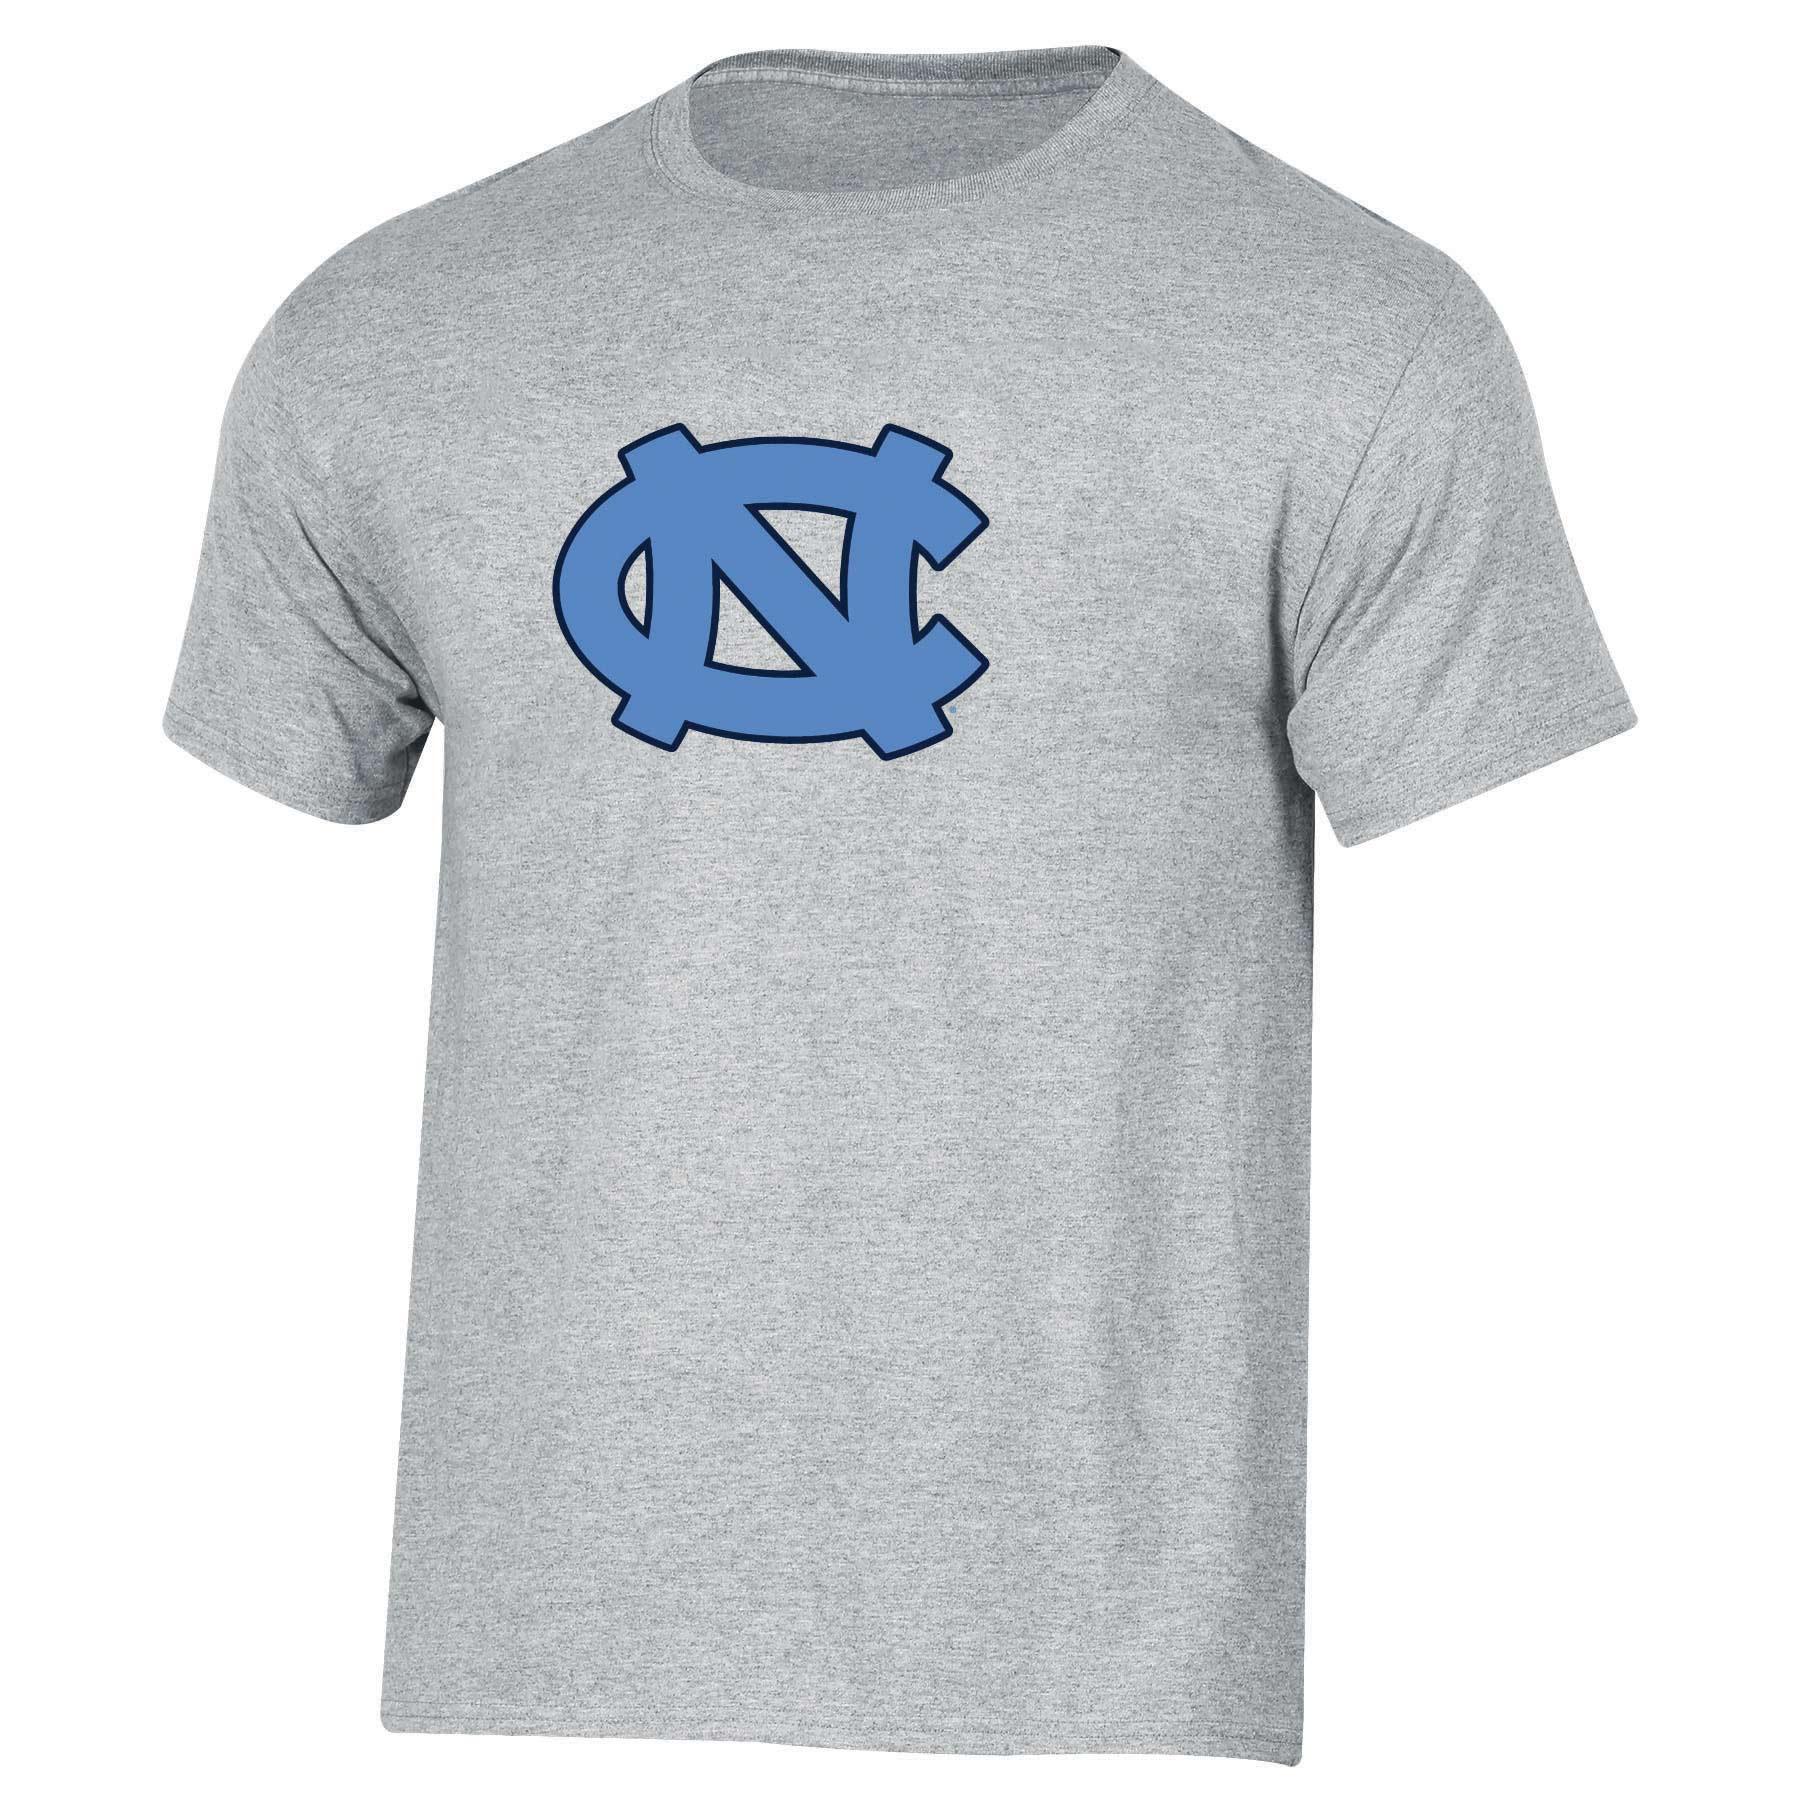 Men's Russell Heathered Gray North Carolina Tar Heels Crew Primary Logo T-Shirt